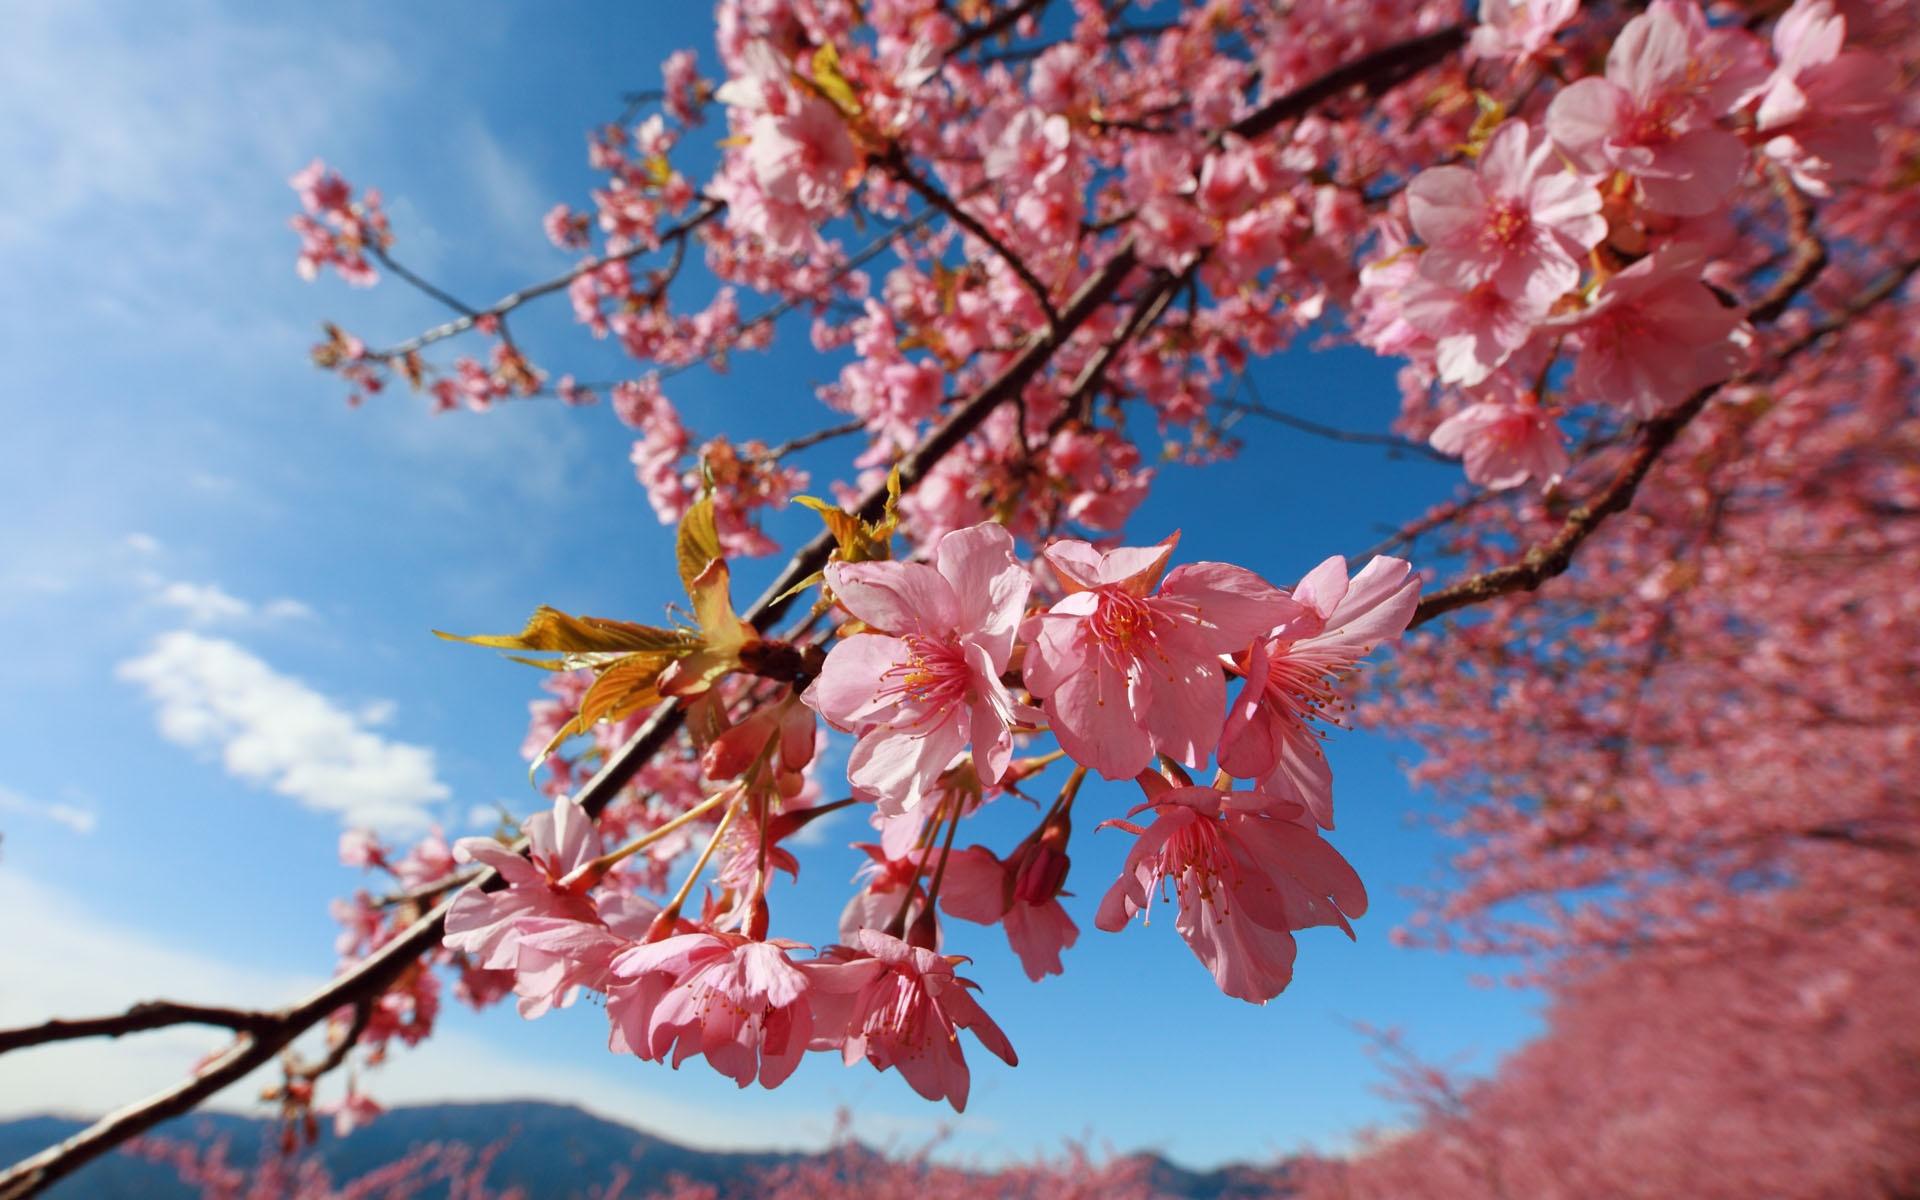 Cherry blossoms 1920x1200